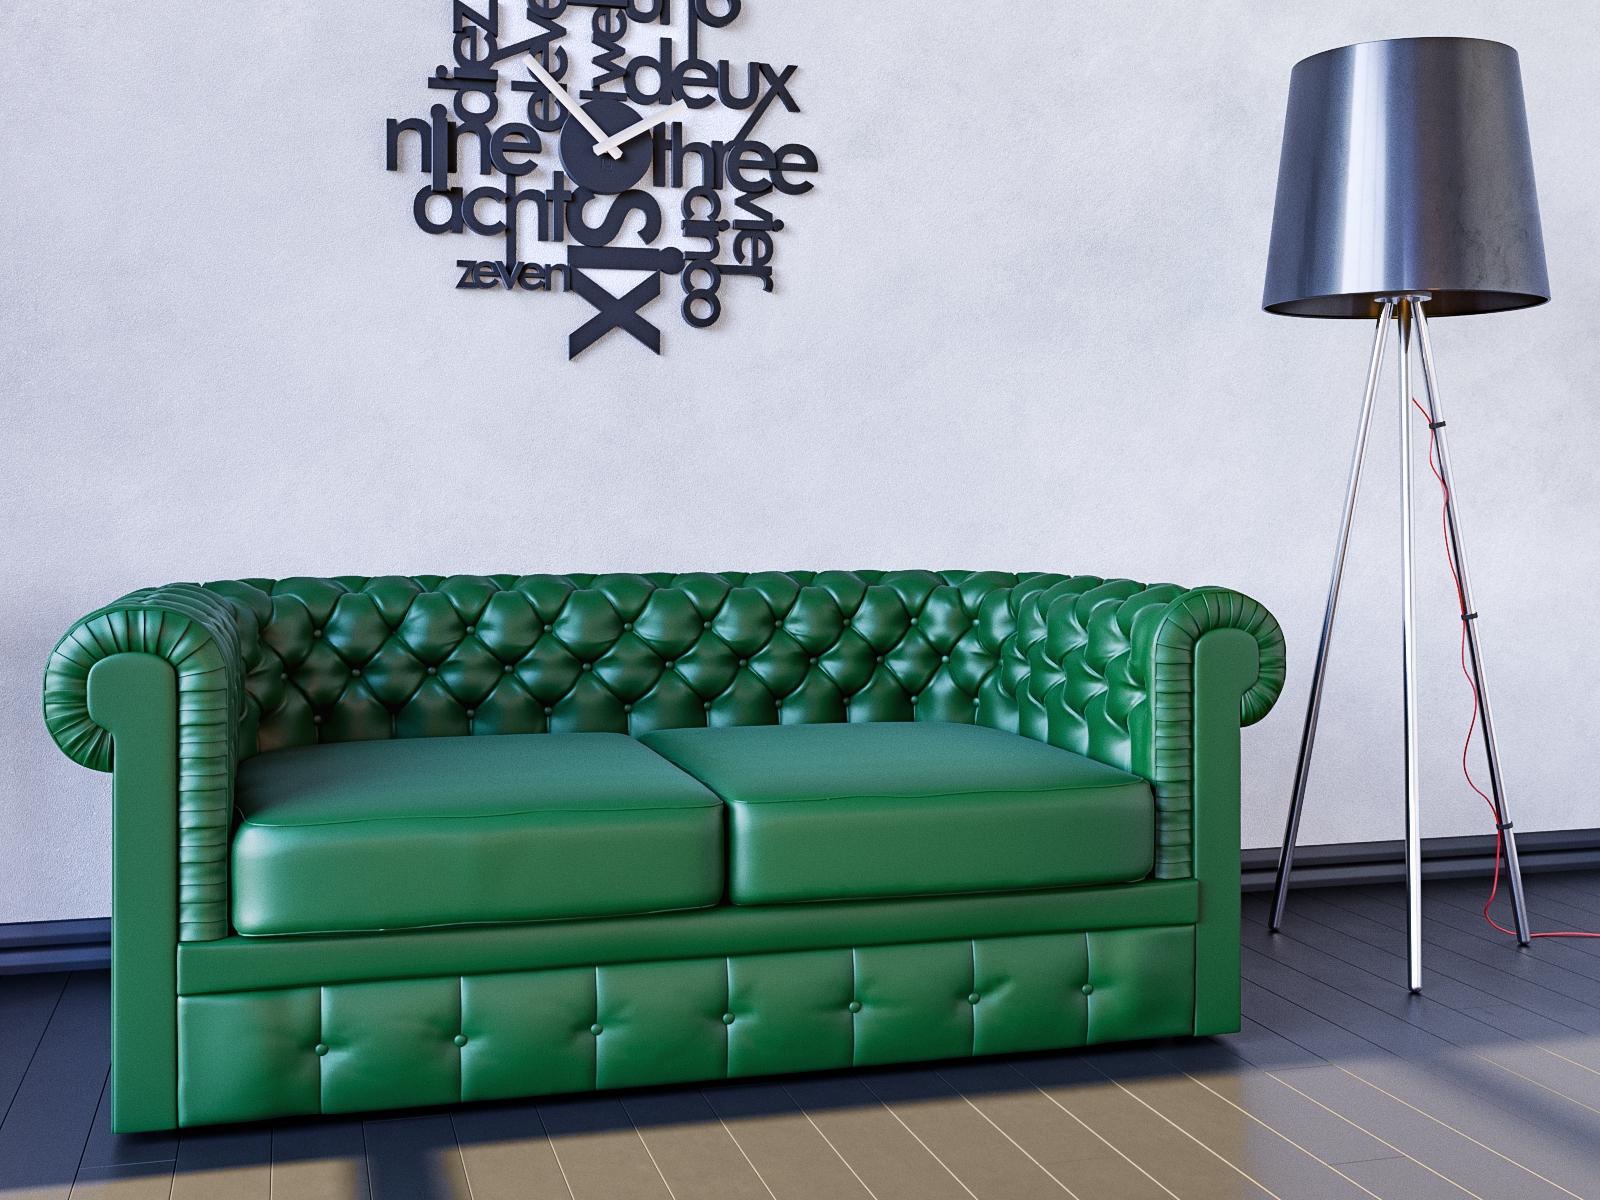 a8a9c5b69 Диван Честер 1 | т. 8 (911) 149-74-44 | Мегас-мебель